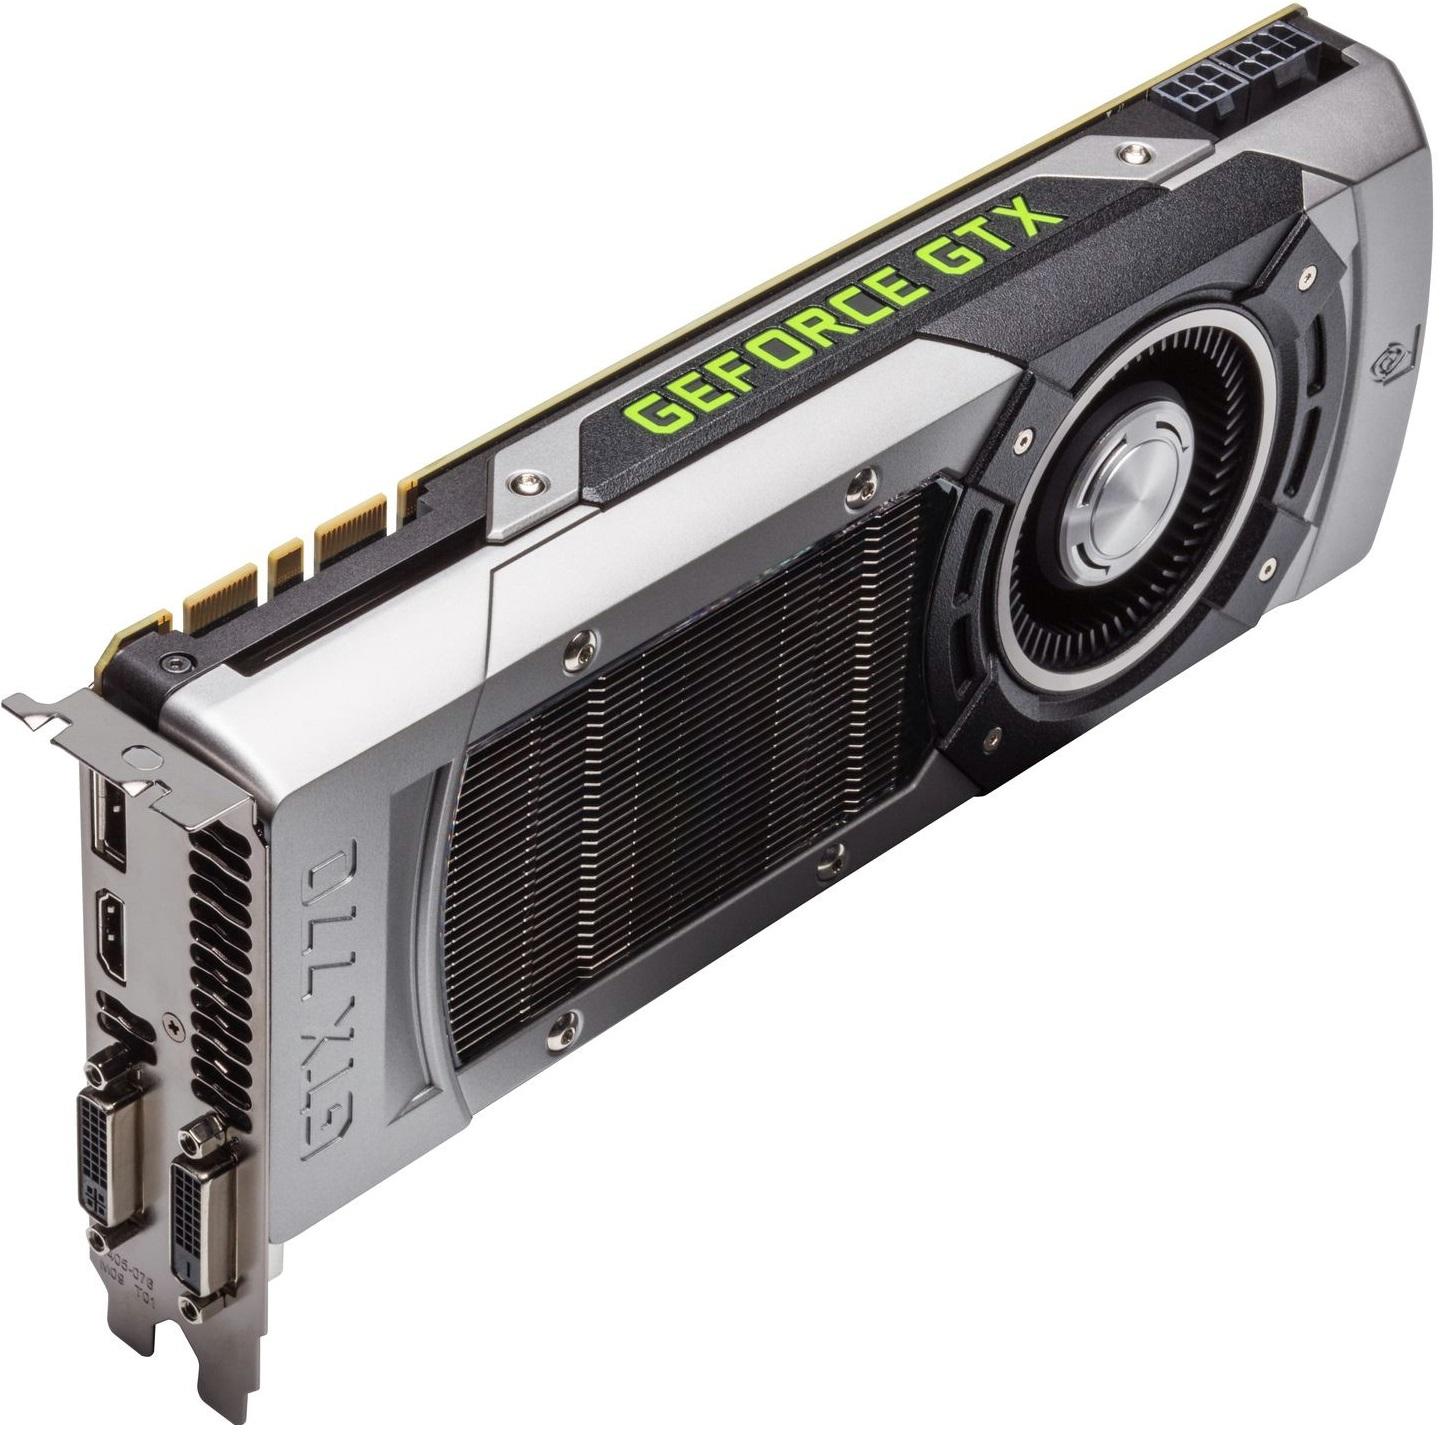 NVidia GeForce или AMD Radeon